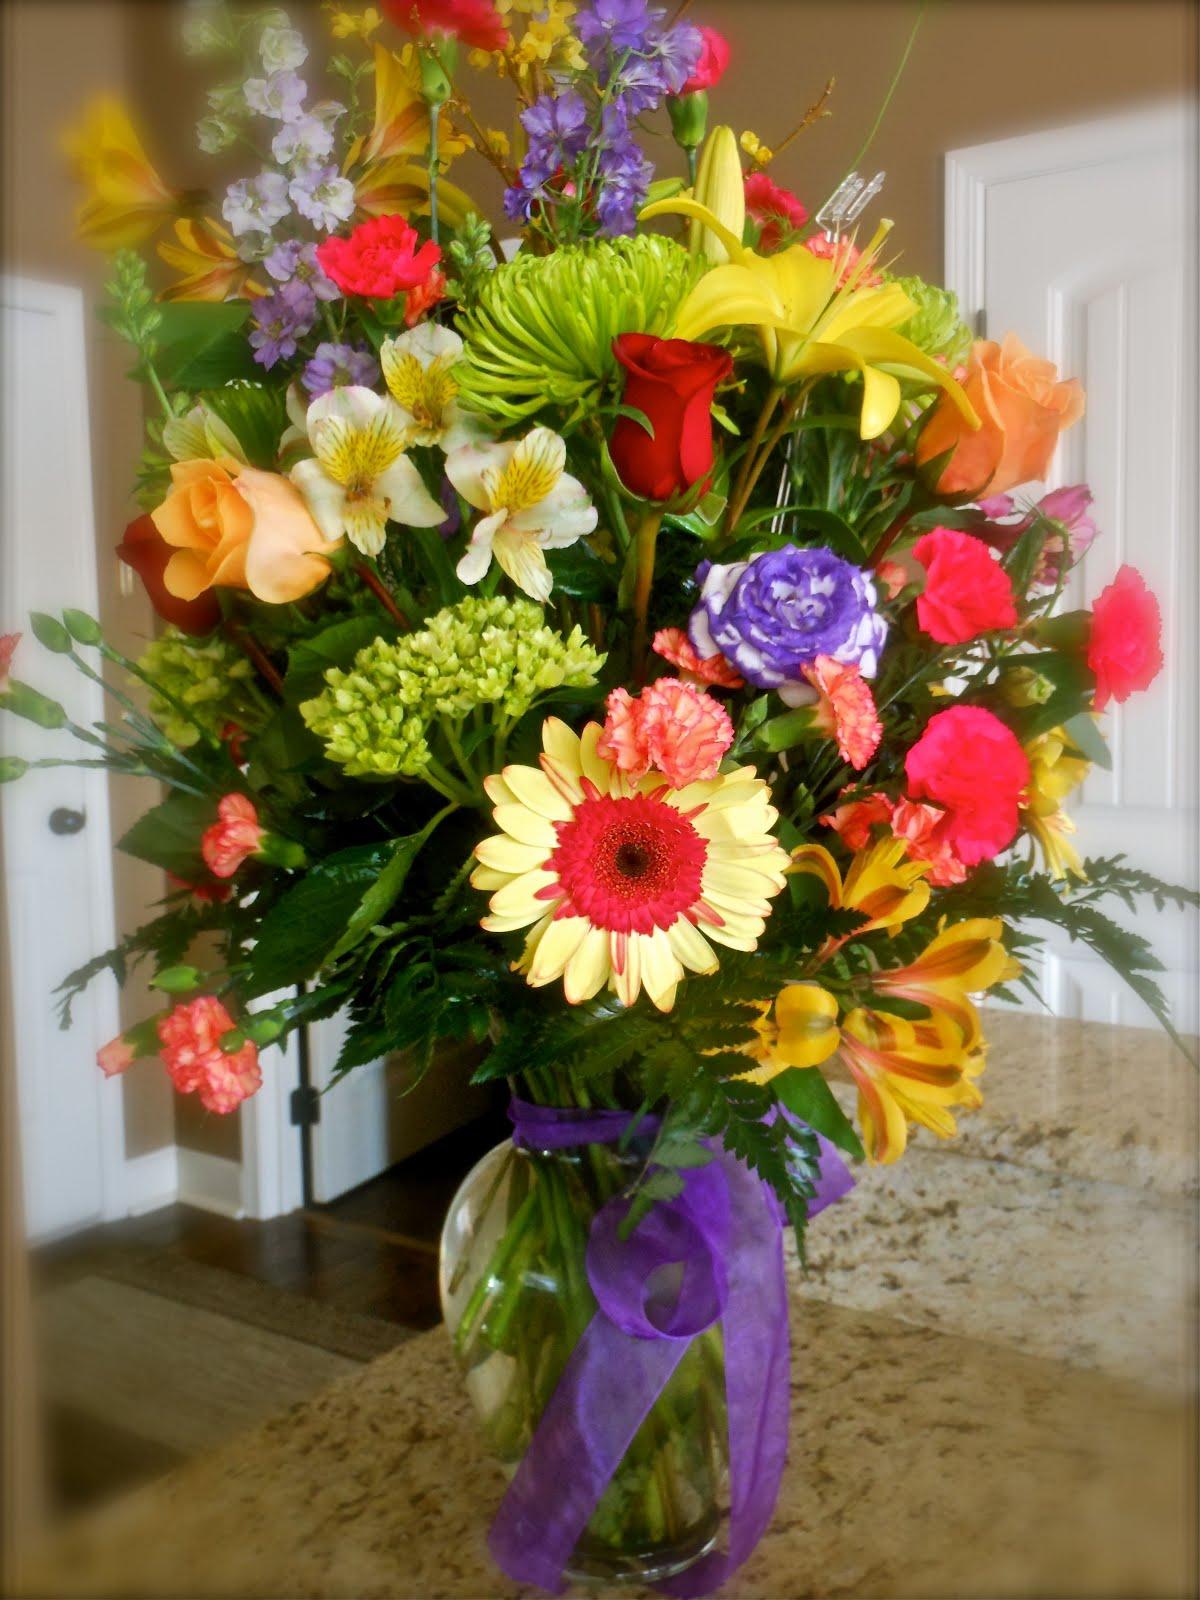 Cheap Flowers Today Gallery Flower Wallpaper Hd